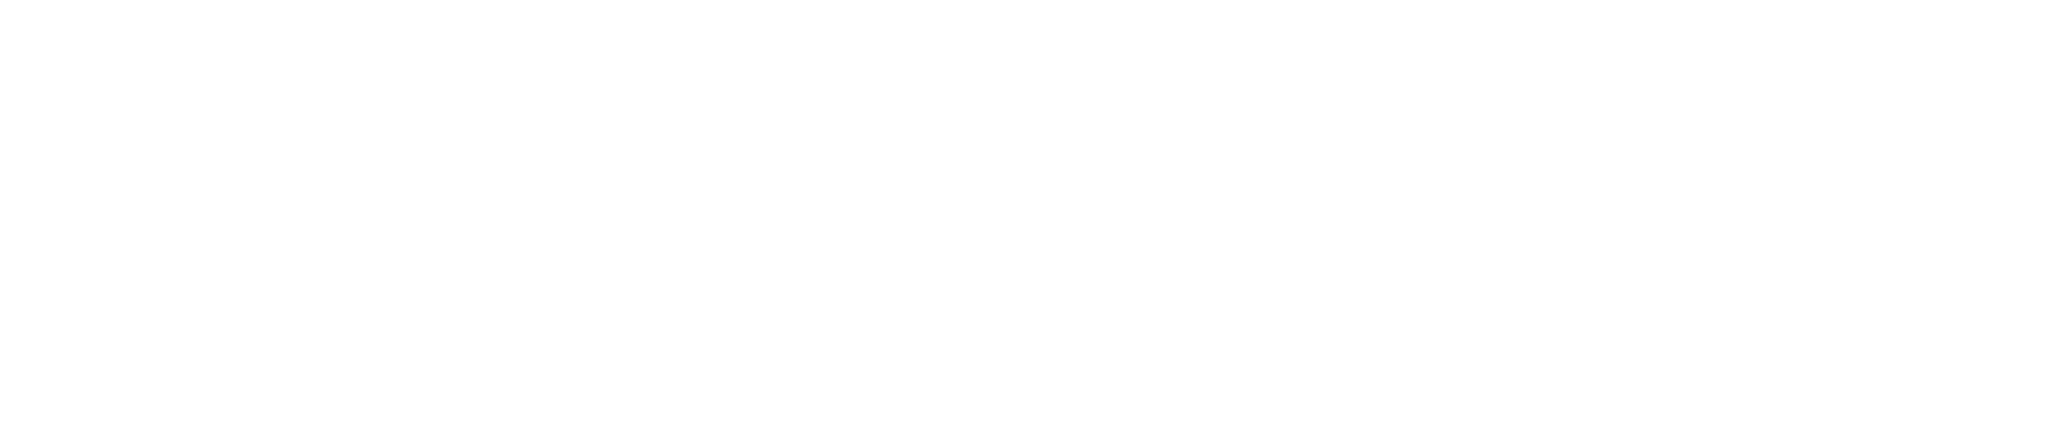 O RH do futuro - parte 1: compliance